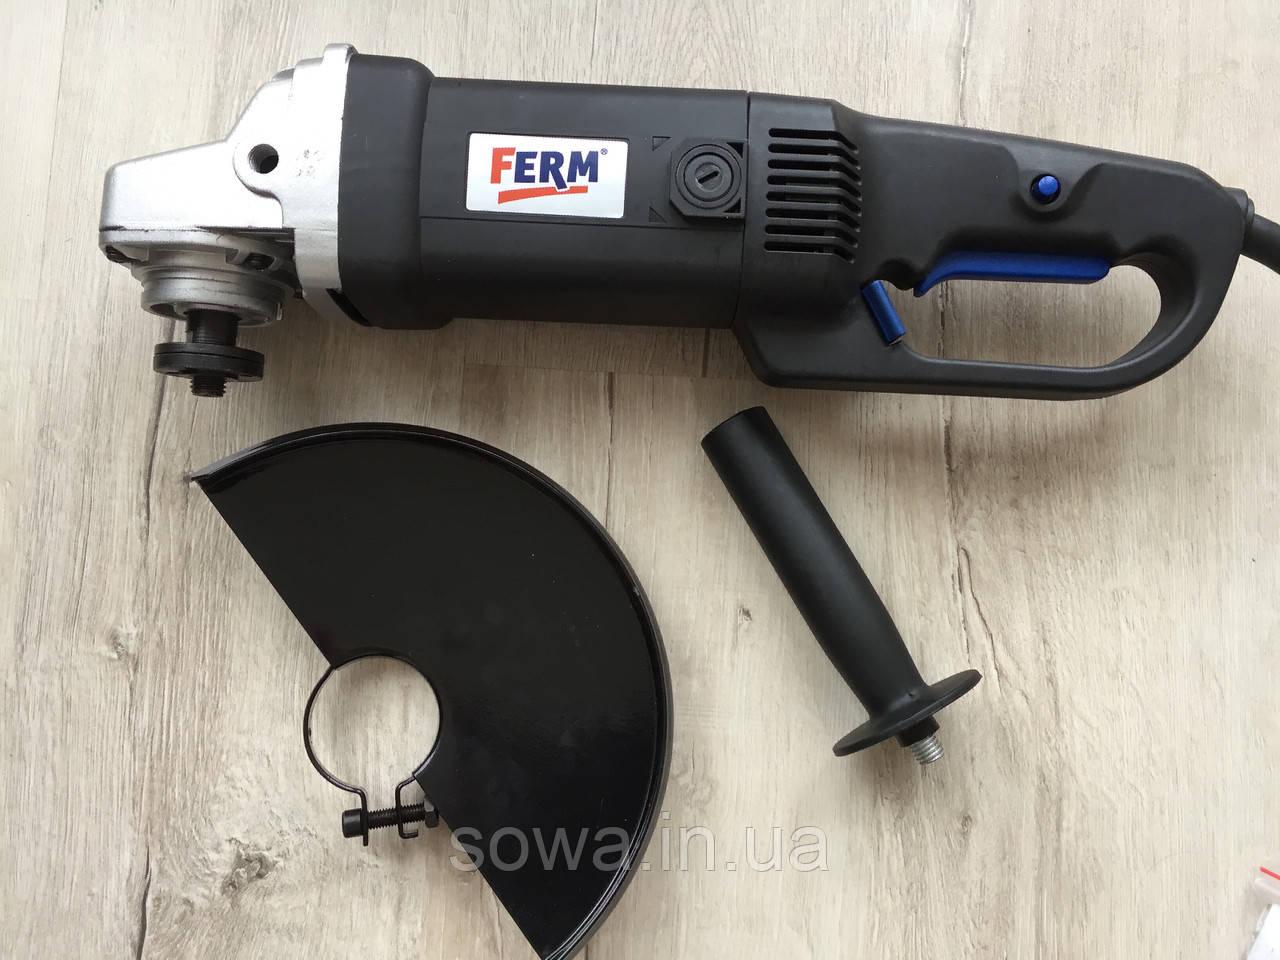 ✔️ Болгарка FERM FAG-230   2000 Вт